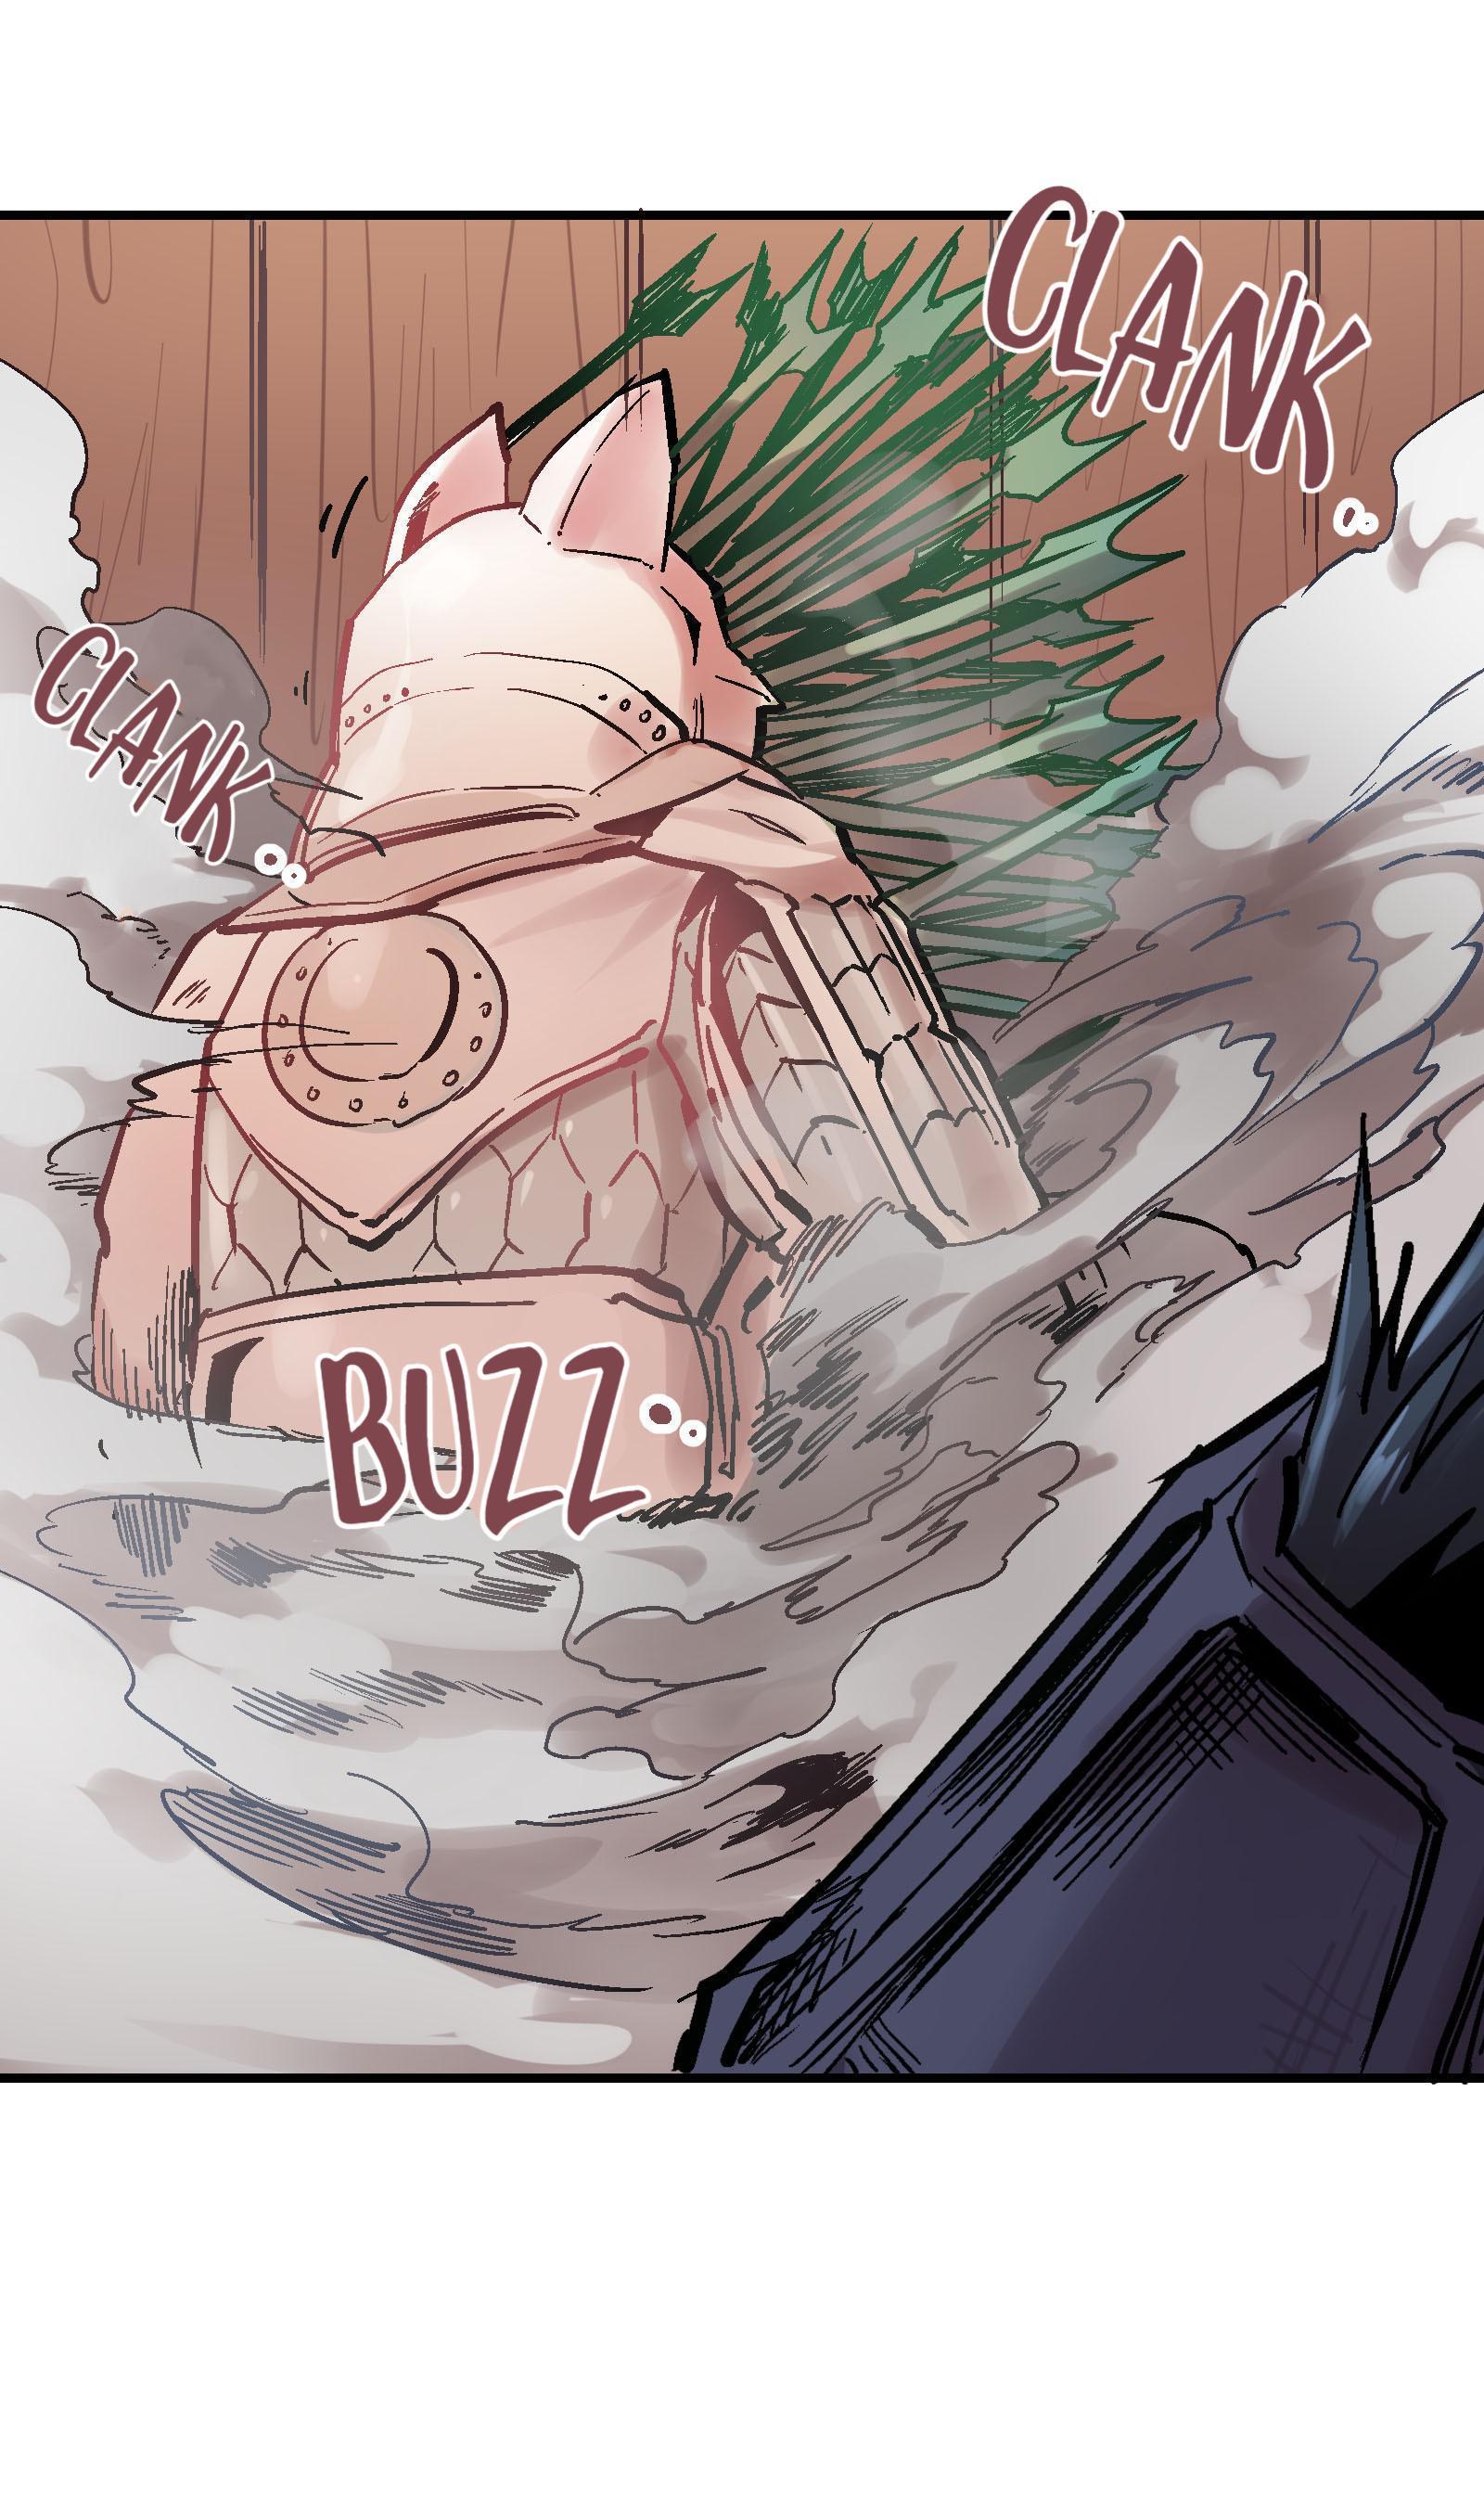 Xiu Tu Chapter 24: All Reality Has Phantoms page 50 - Mangakakalot